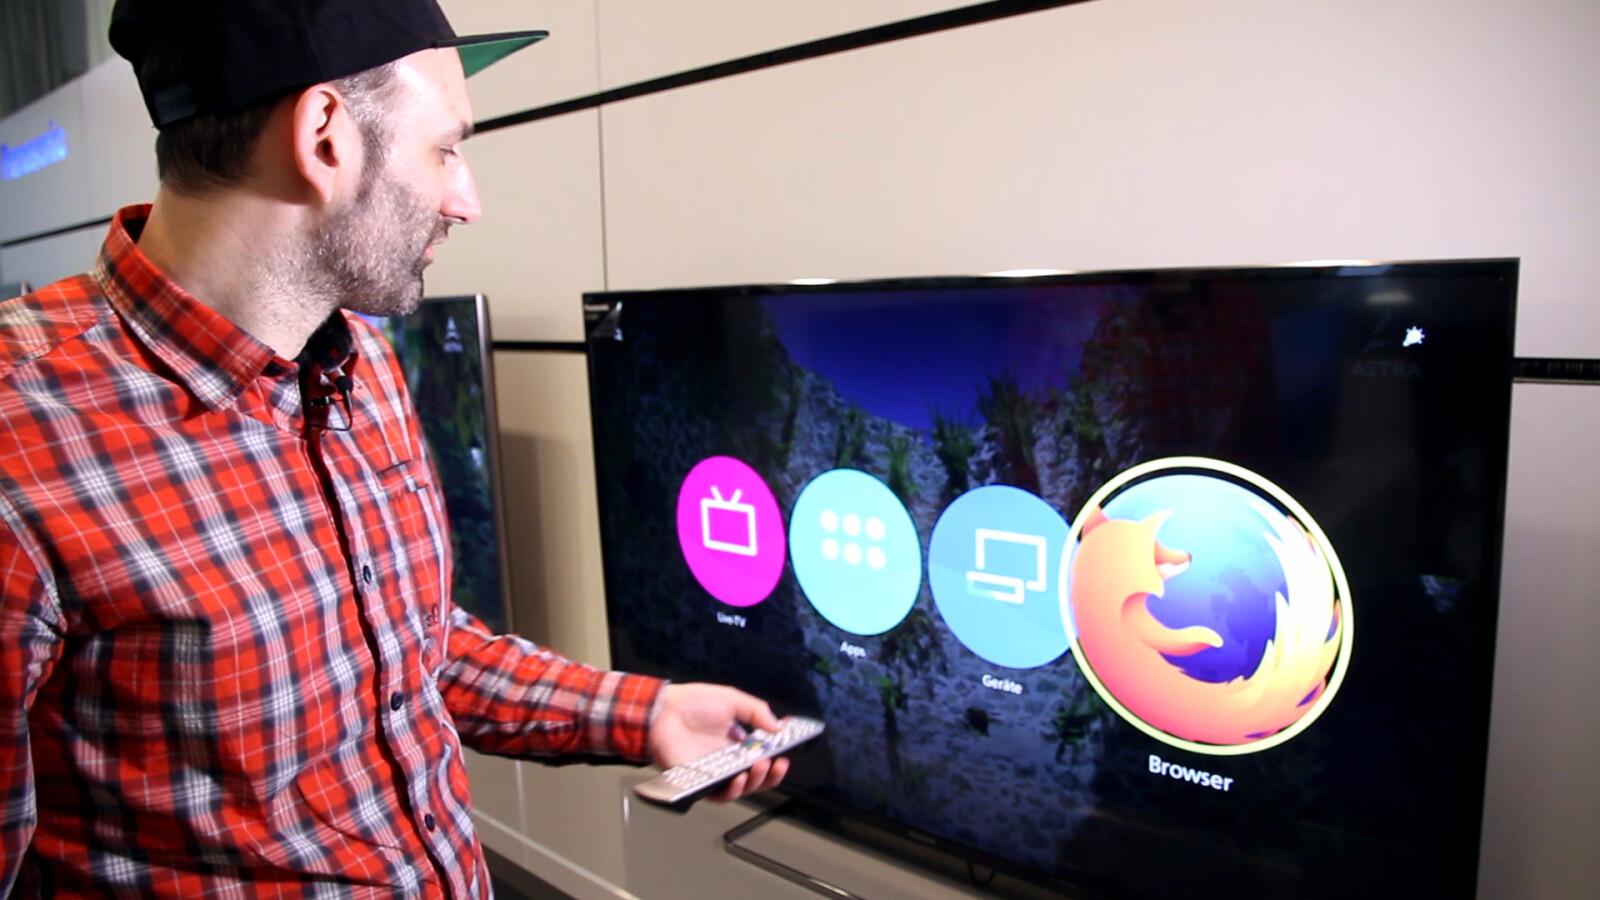 Im Kurztest: Panasonic Firefox OS auf dem Smart-TV